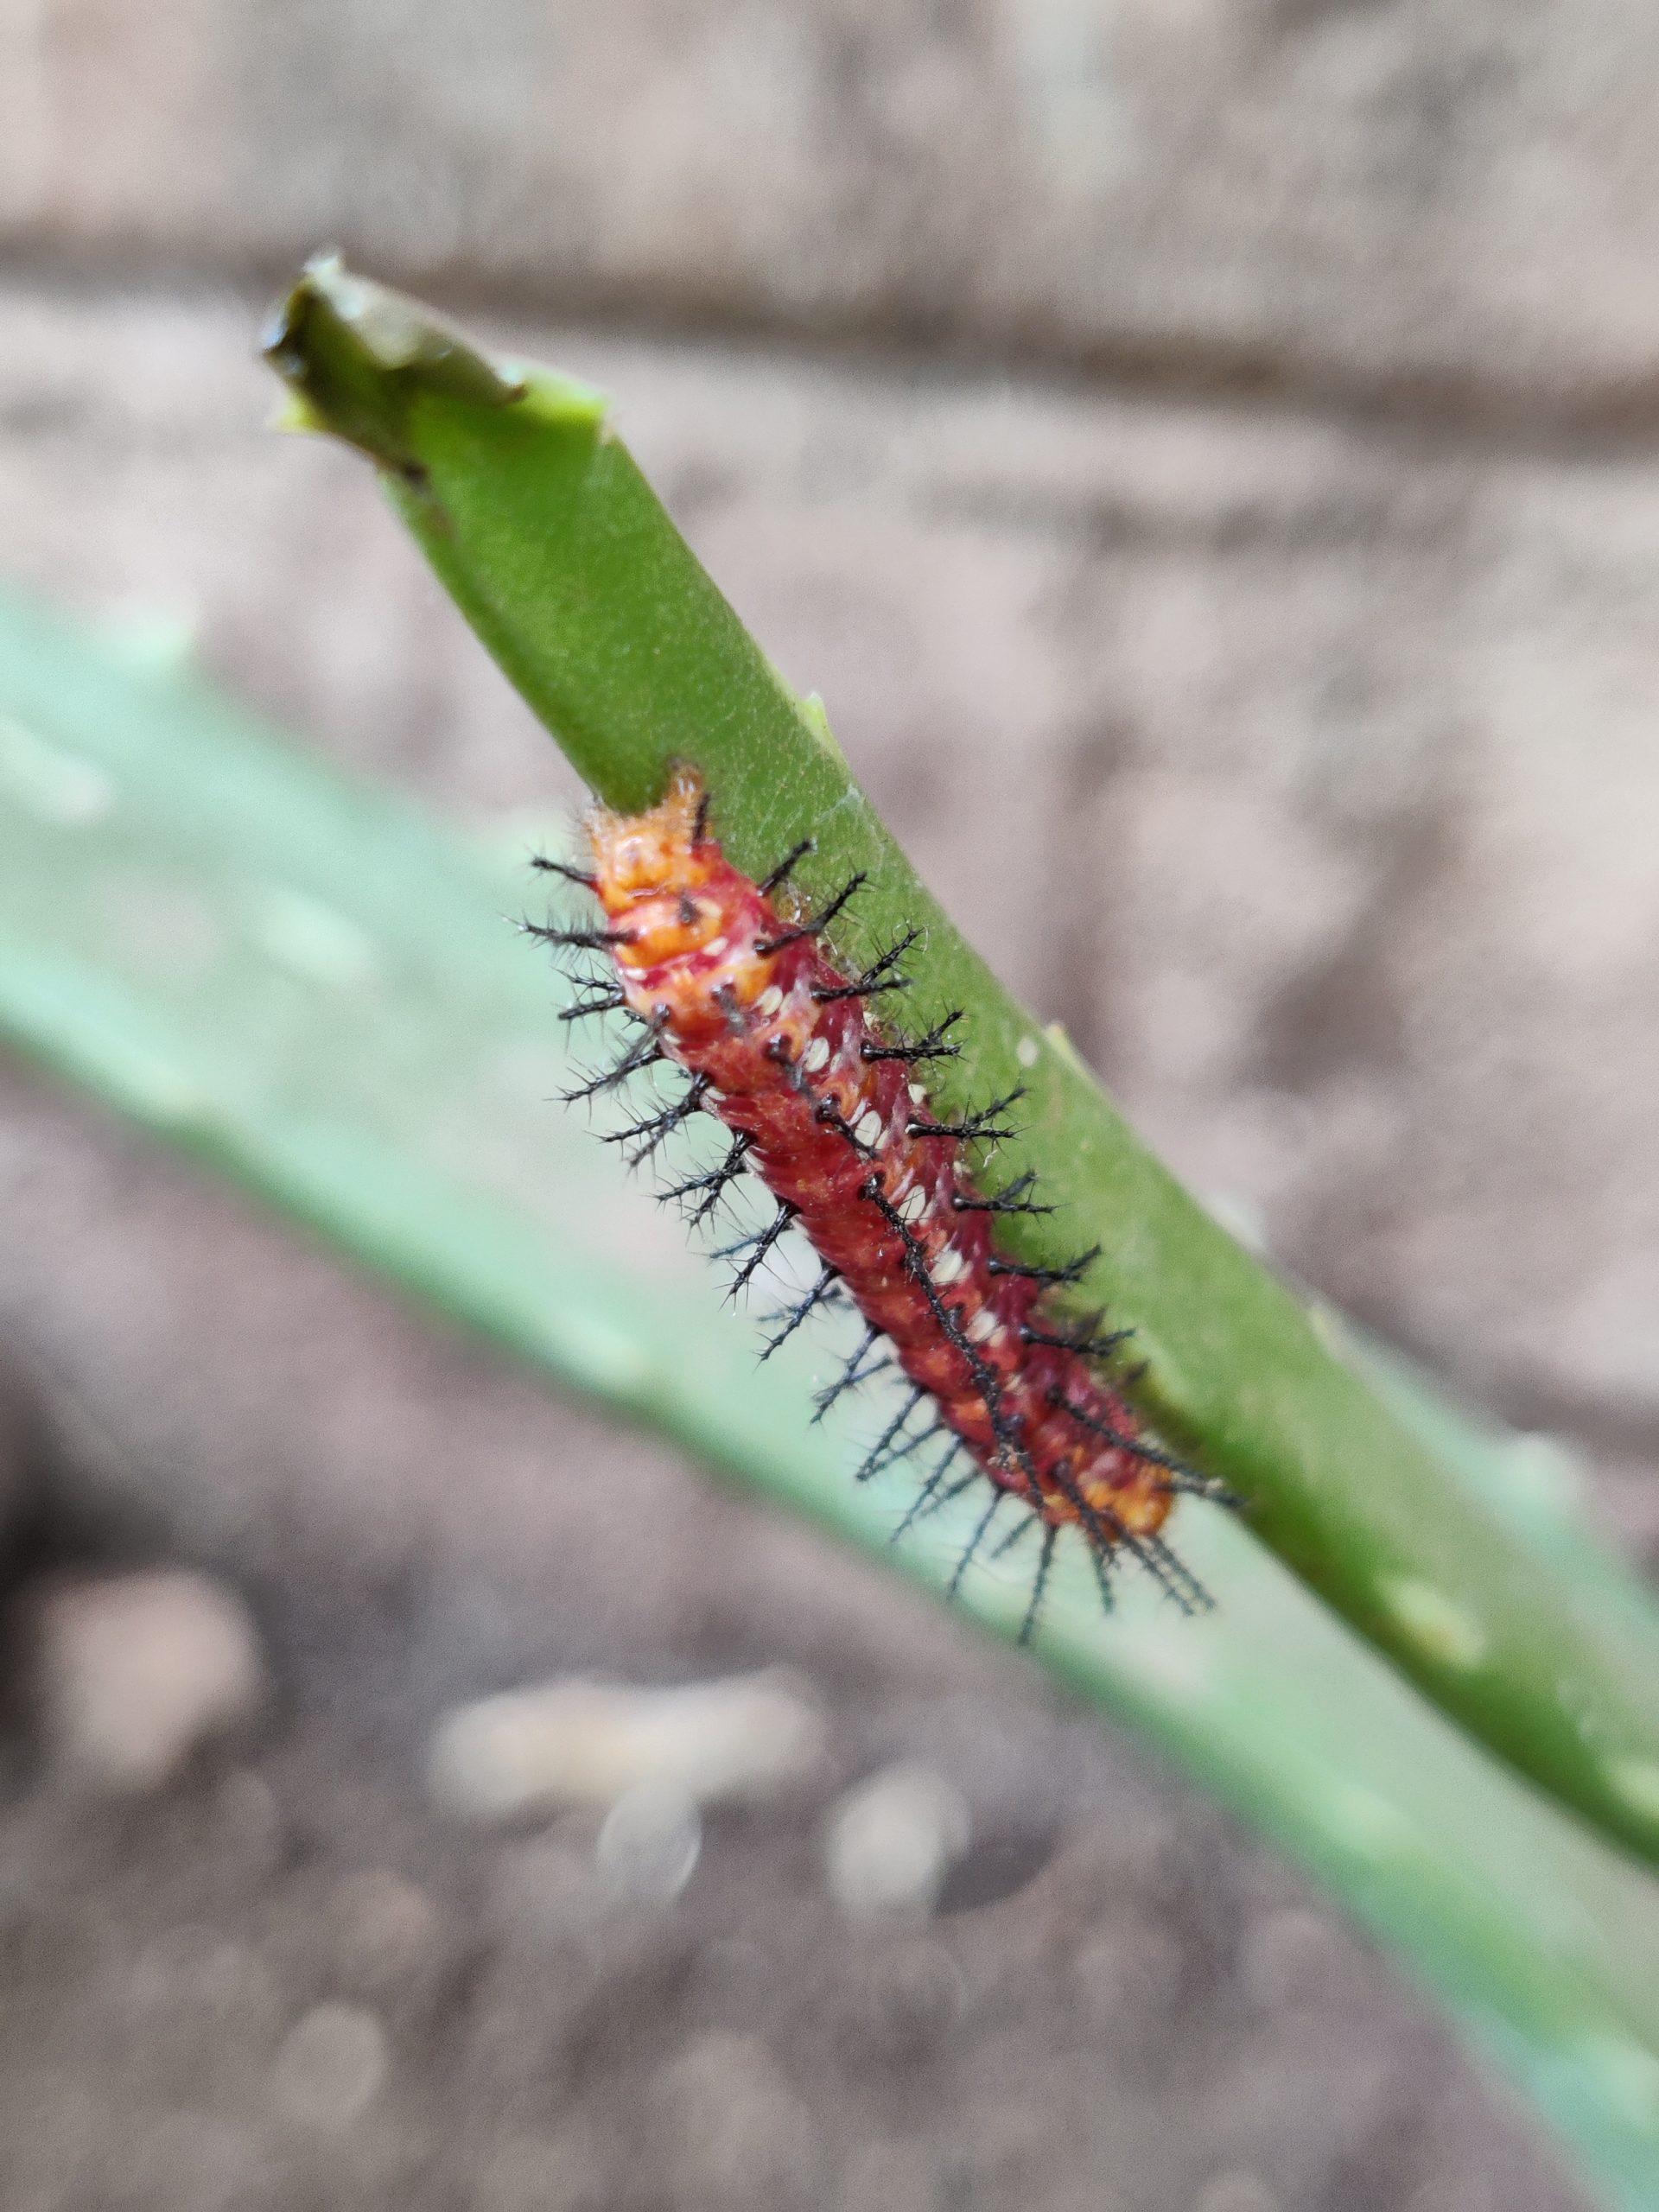 Caterpillar on plant leaf